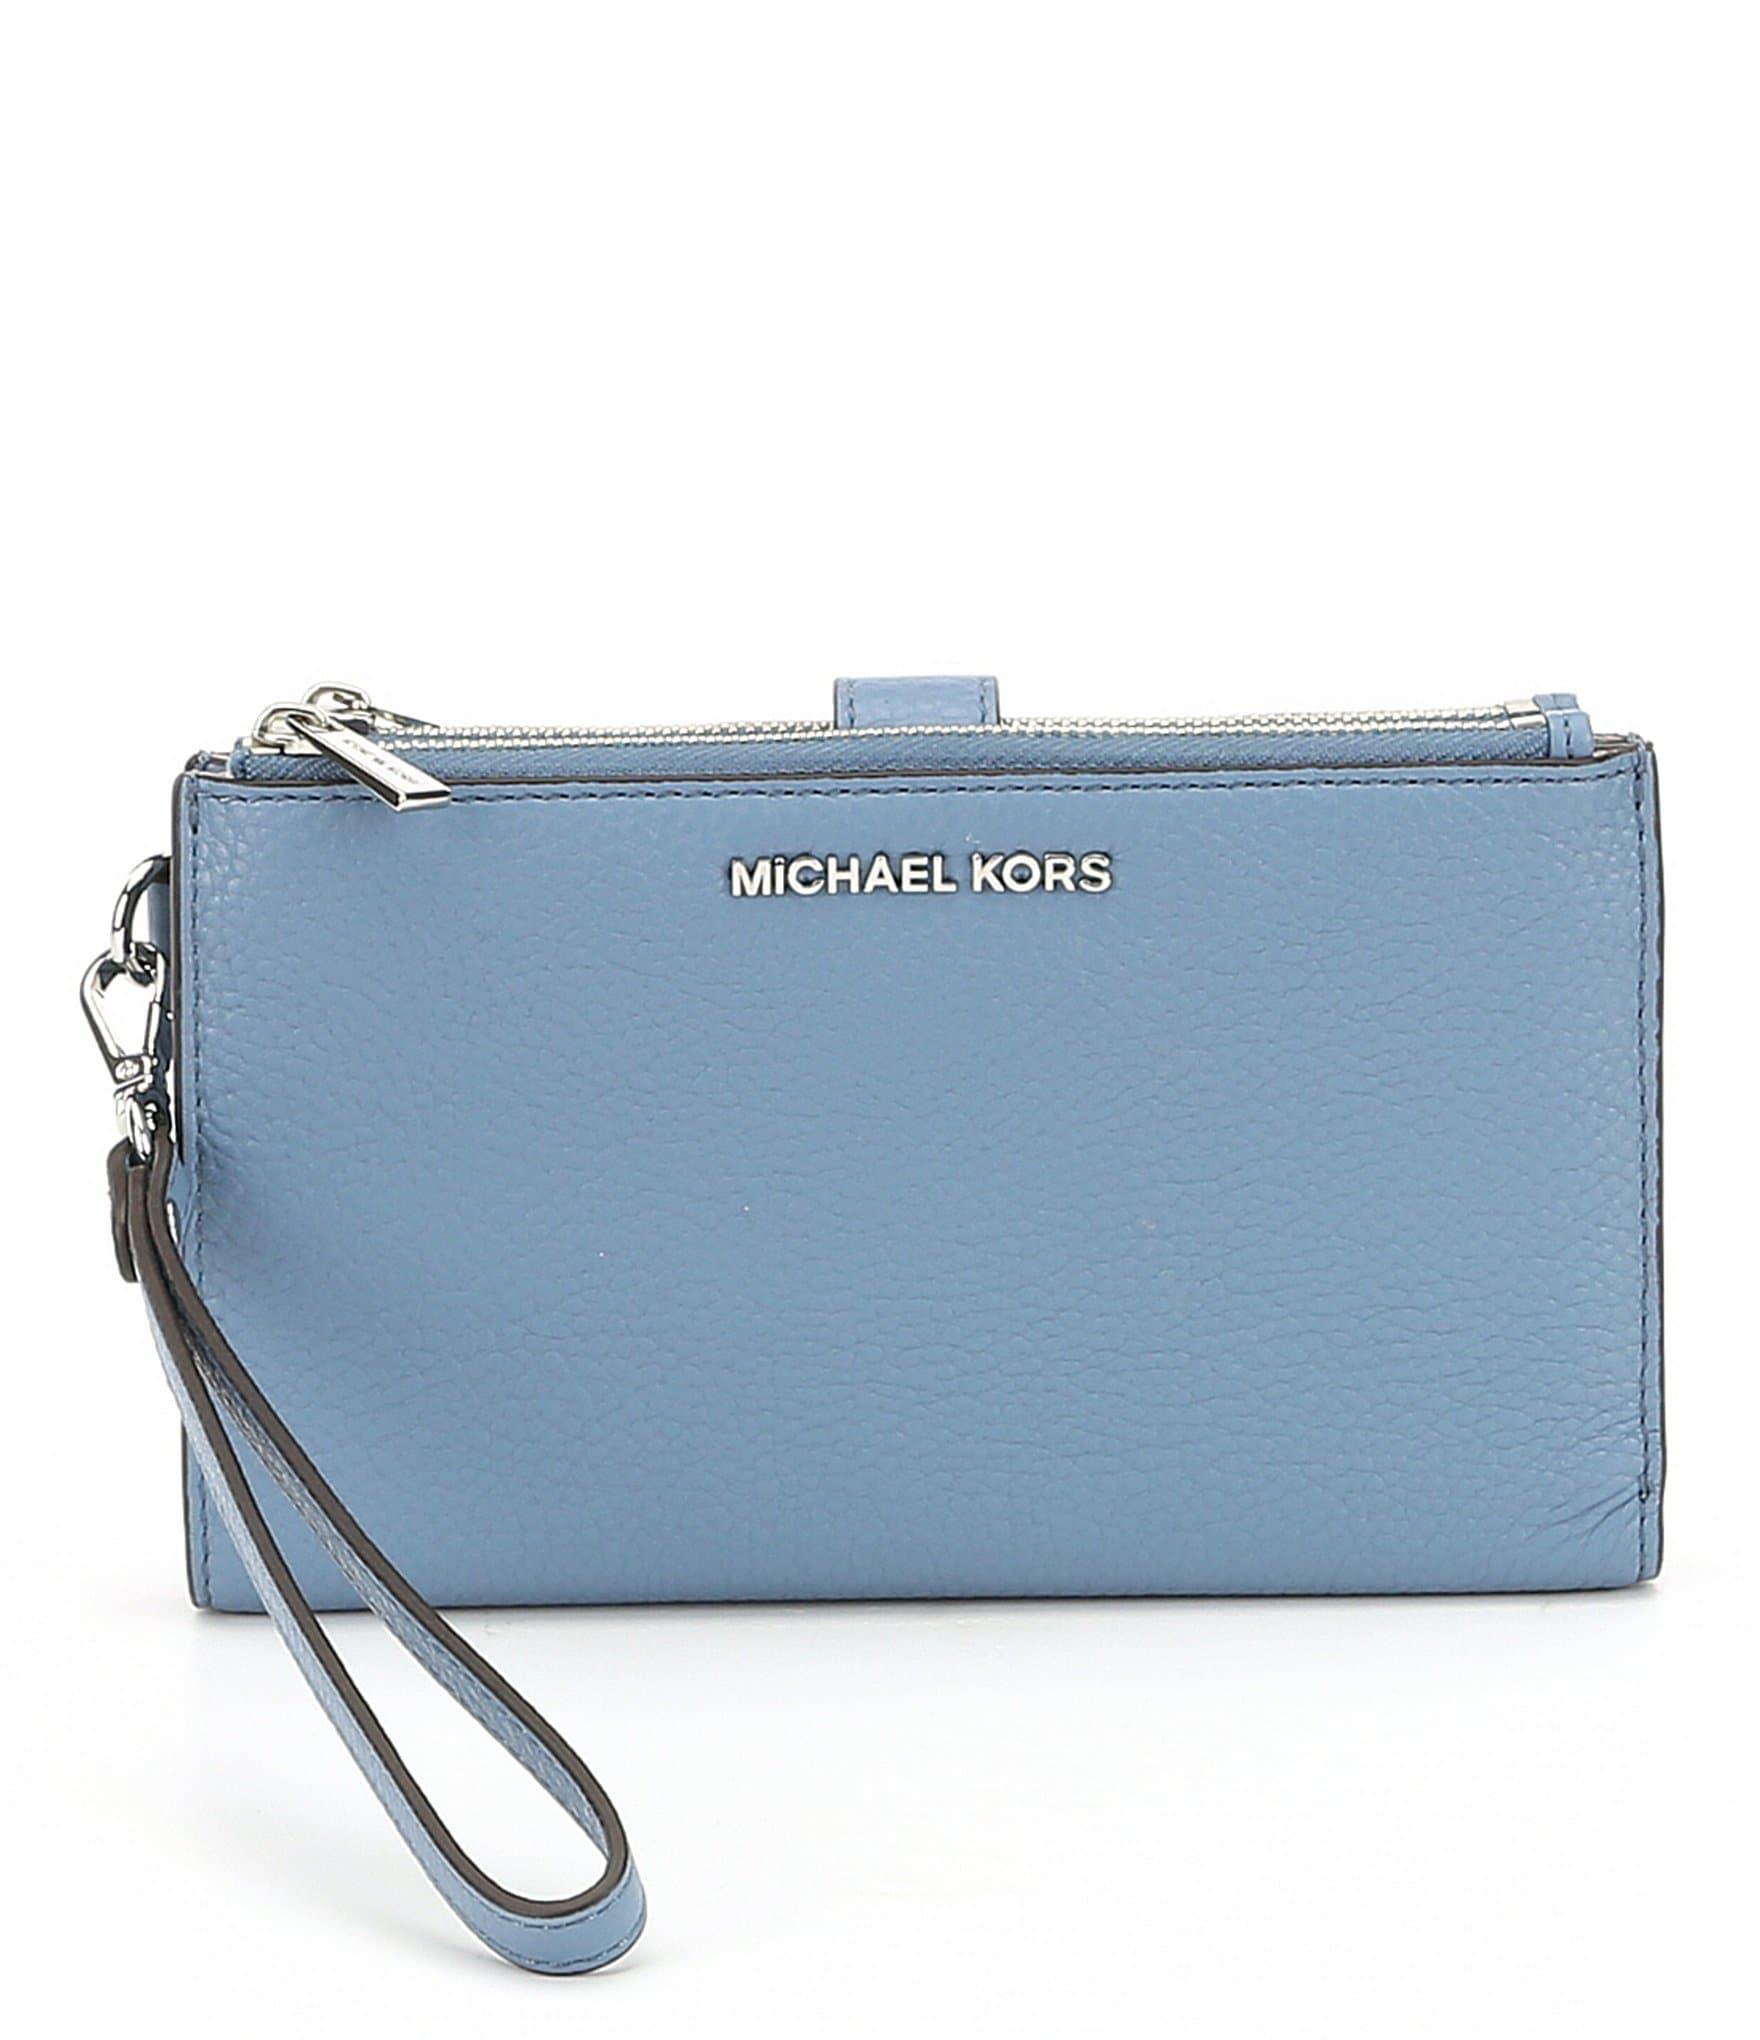 eb6ace262070 ... Sale Clearance Handbags, Purses Wallets Dillards New Cheap Michael Kors  Online UK Pebbled Large Khaki Shoulder ...